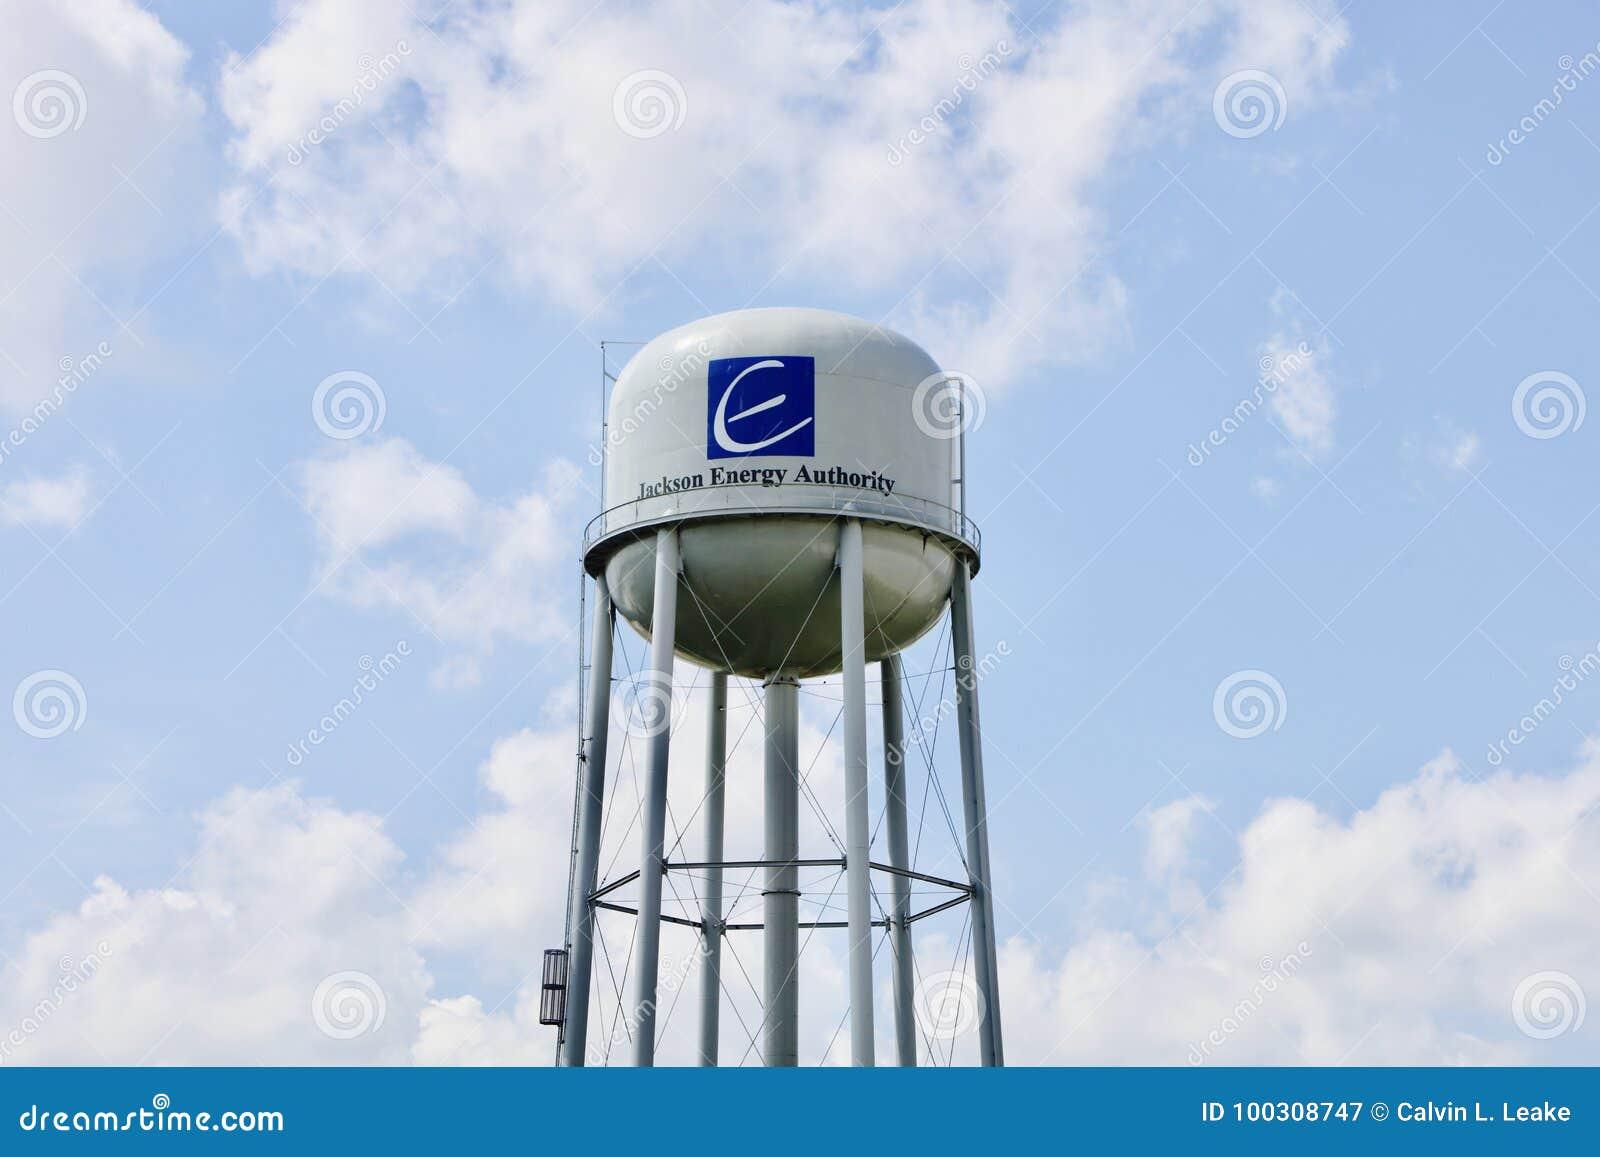 Jackson Energy Authority